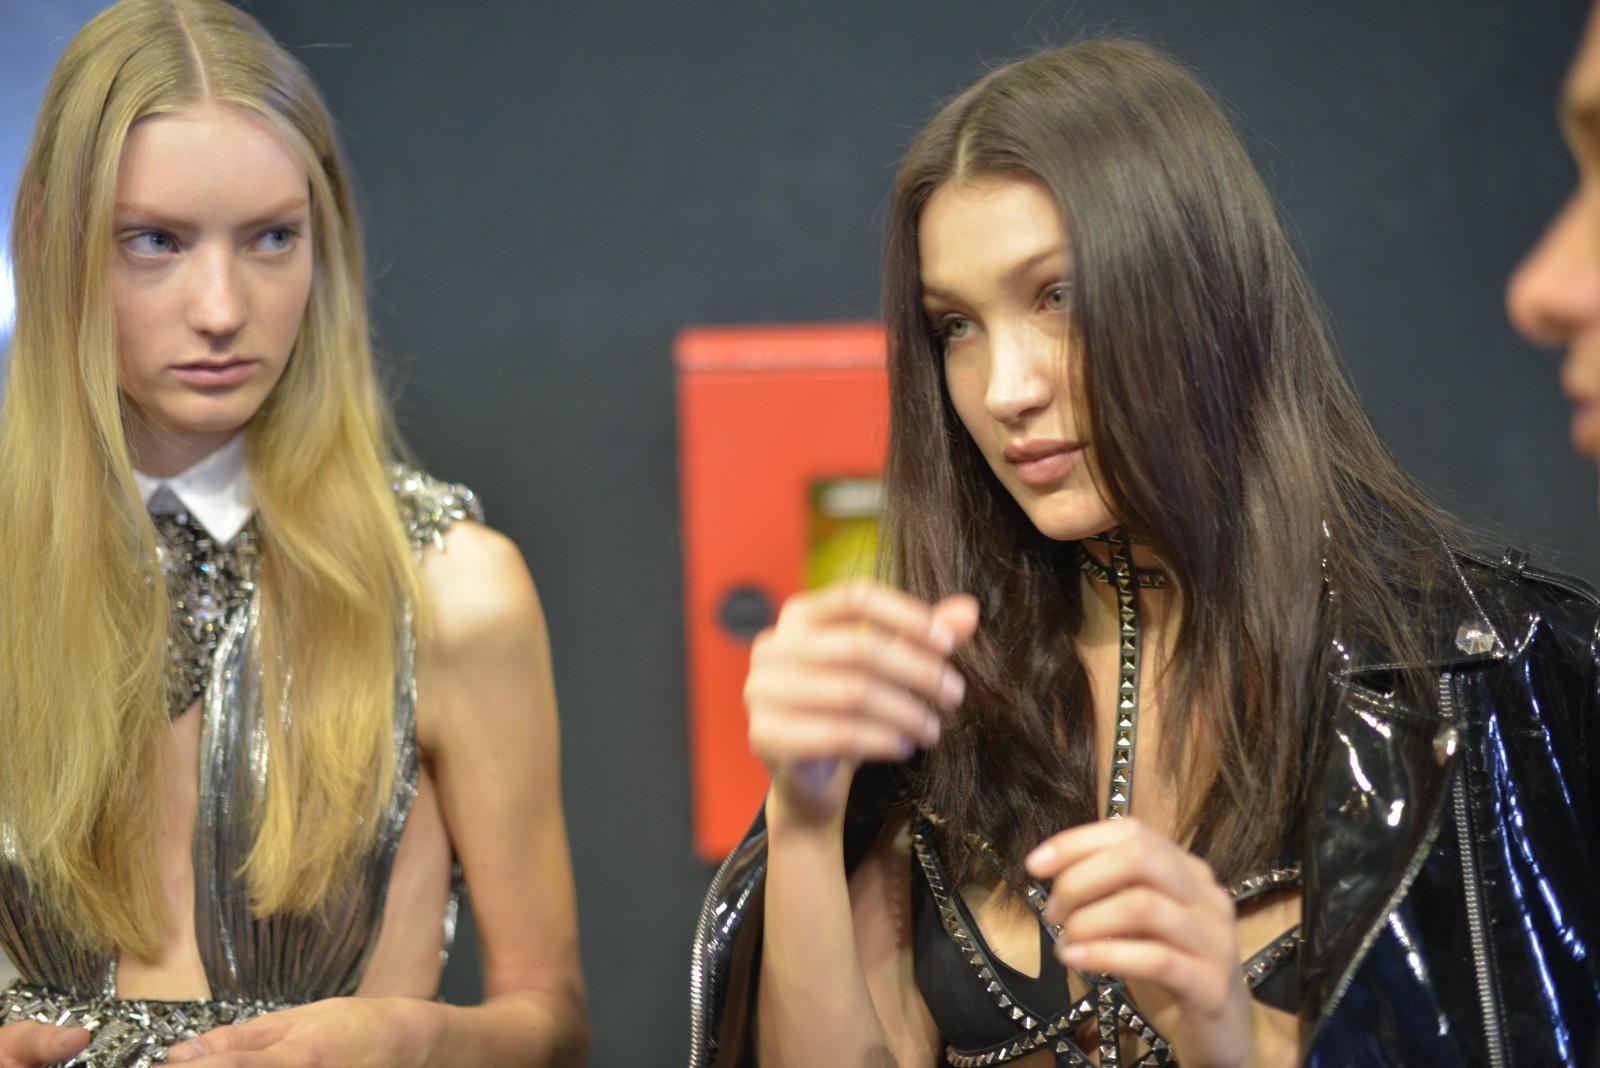 Bella Hadid backstage at Philipp Plein's SS16 fashion show during Milan fashion week